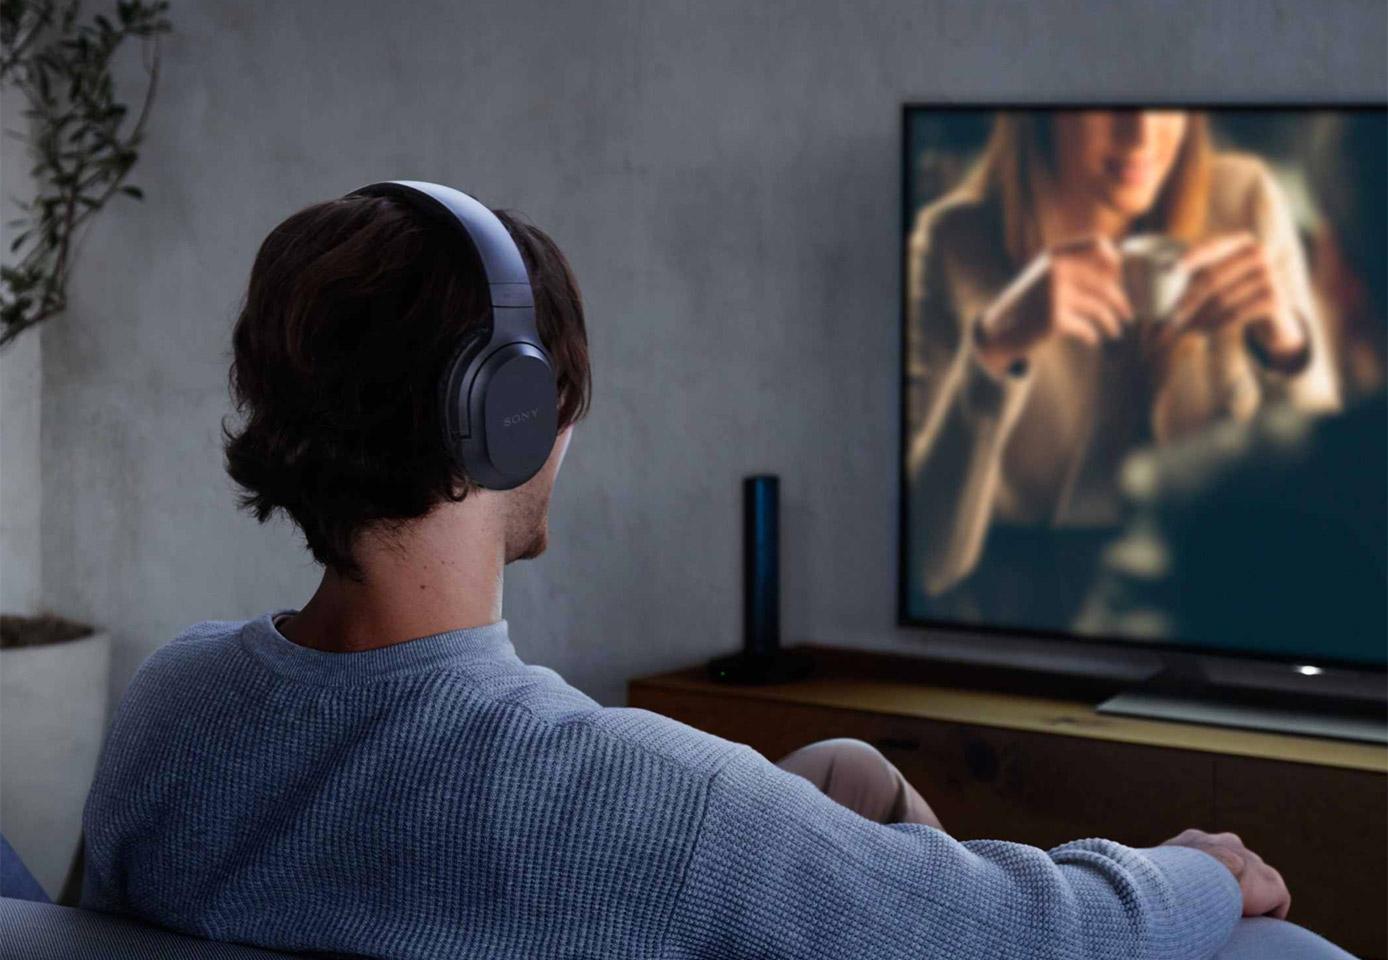 Deal: Sony Home Theater Headphones